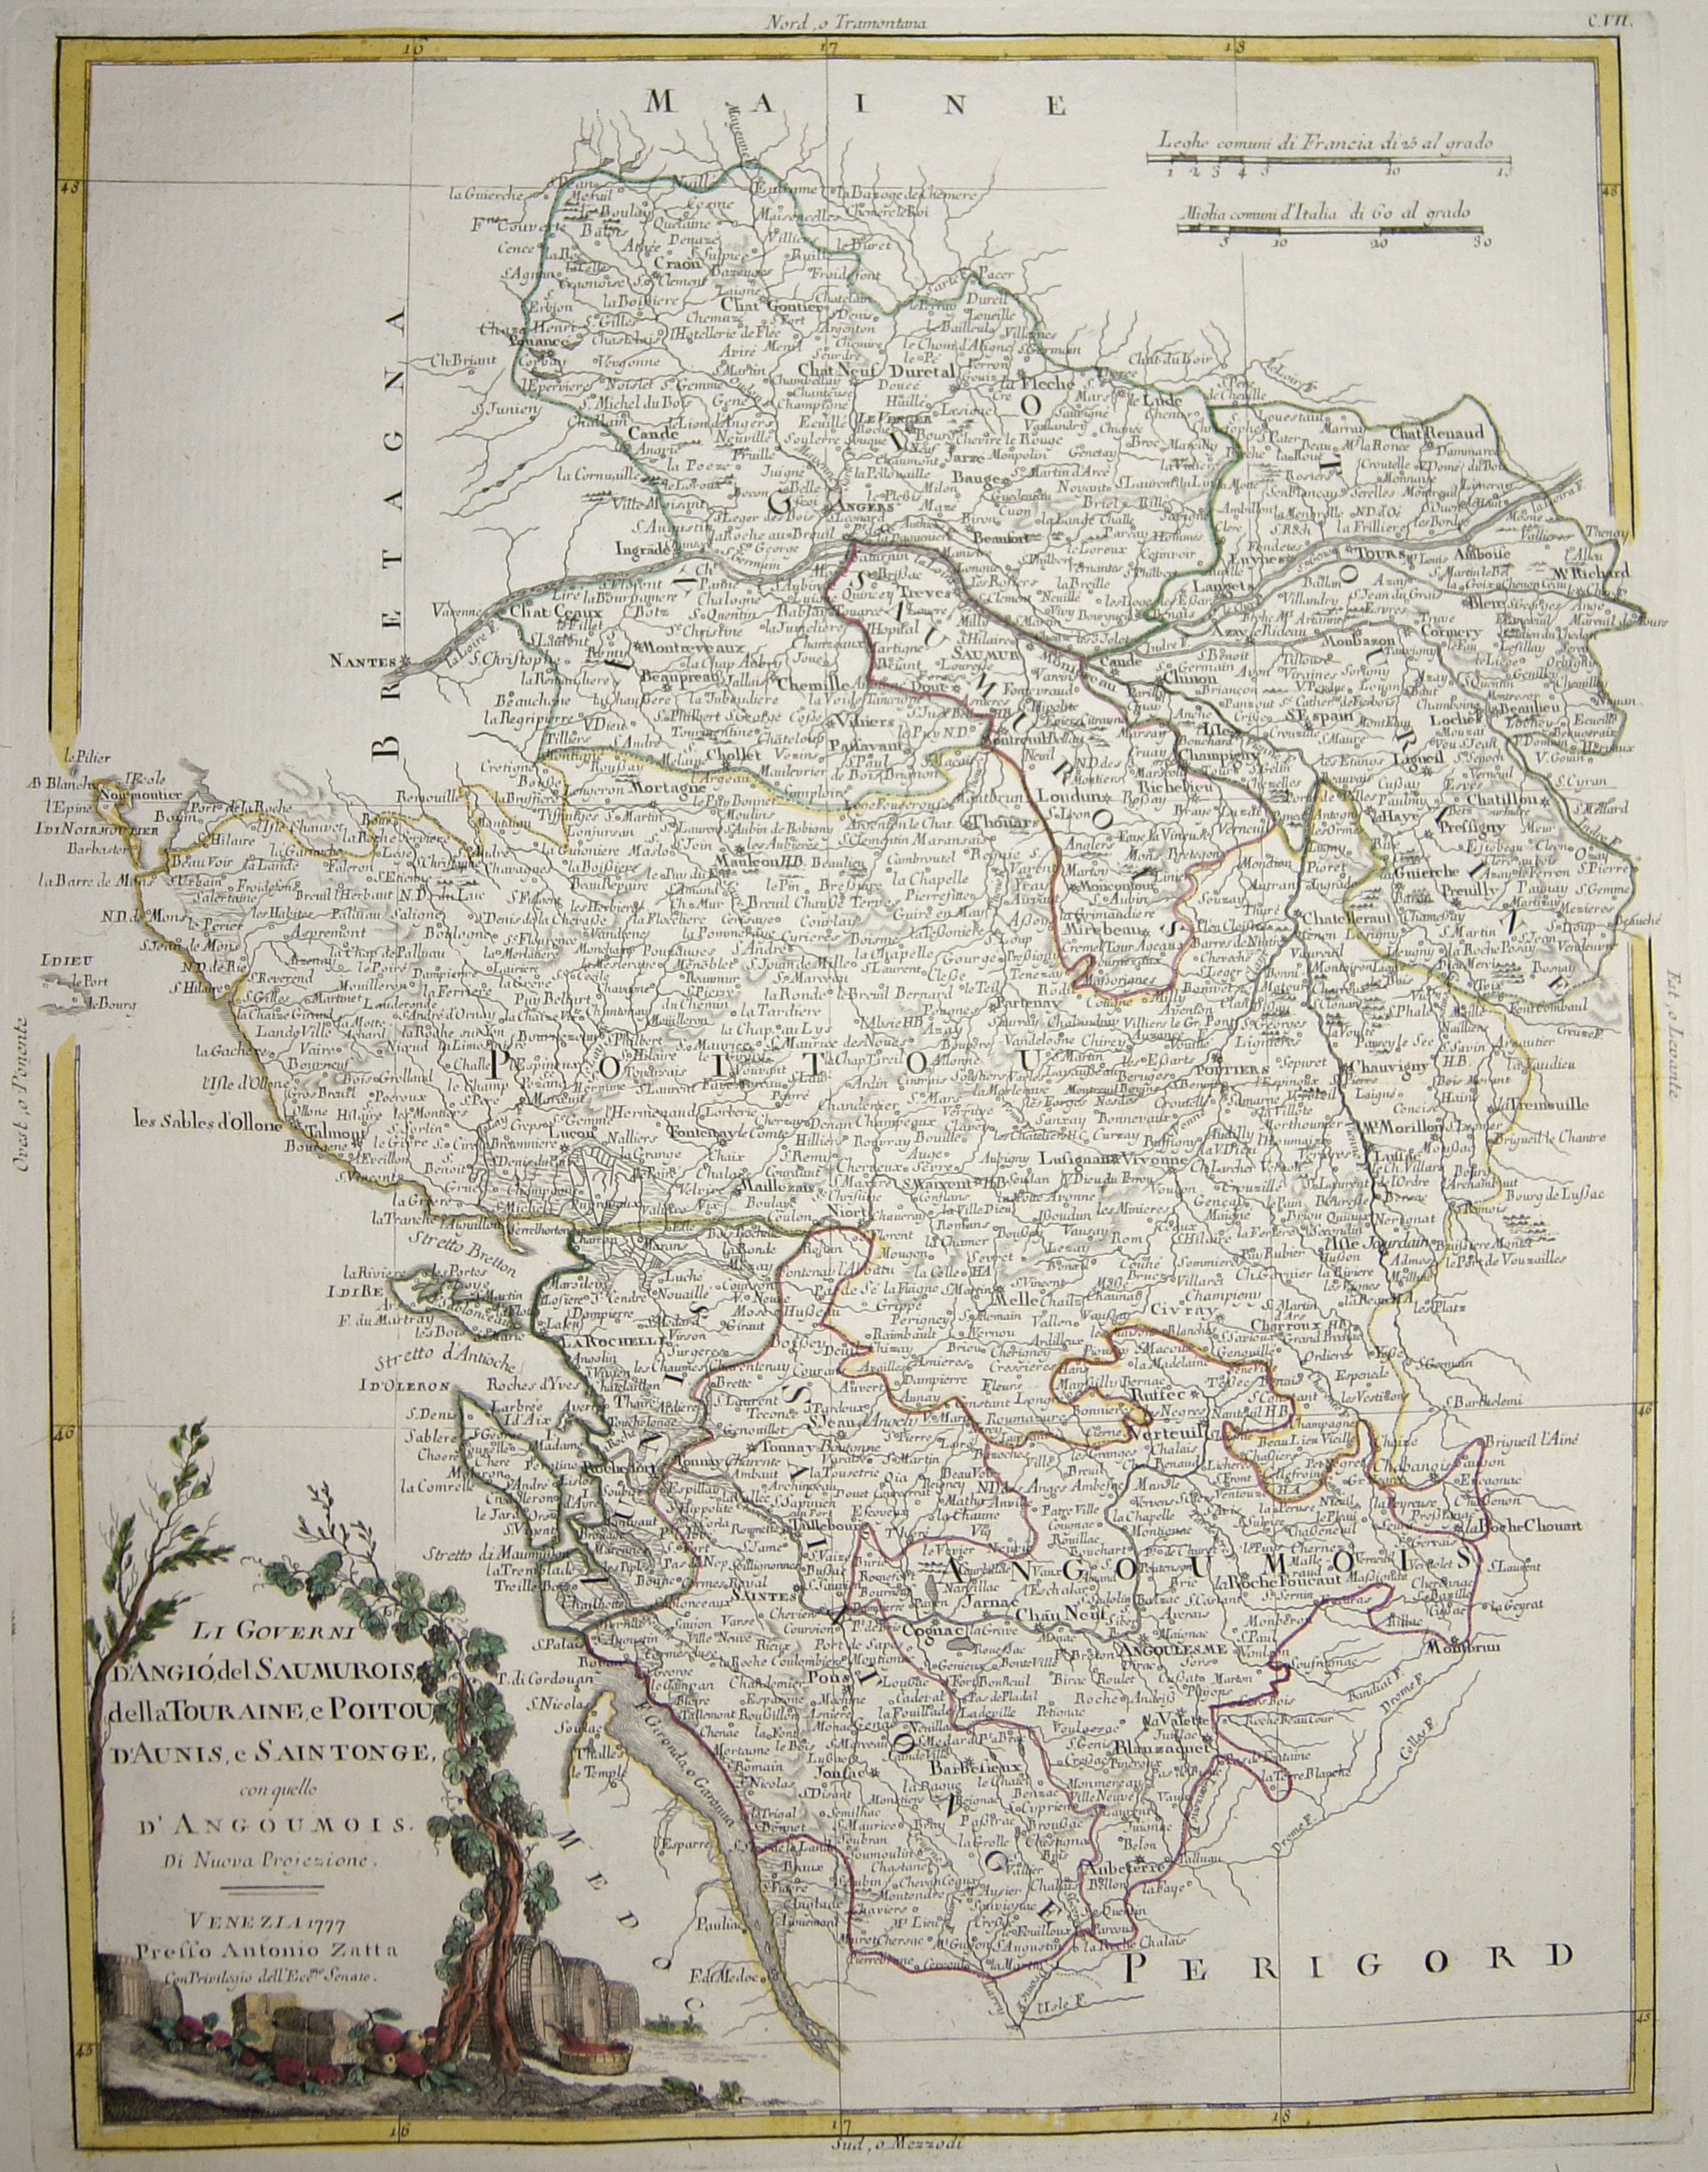 Zatta  Li Governi d'Angió, del Saumurois, della Touraine, e Poitou, d'Aunis, e Saintonge, con quello d'Angoumois.